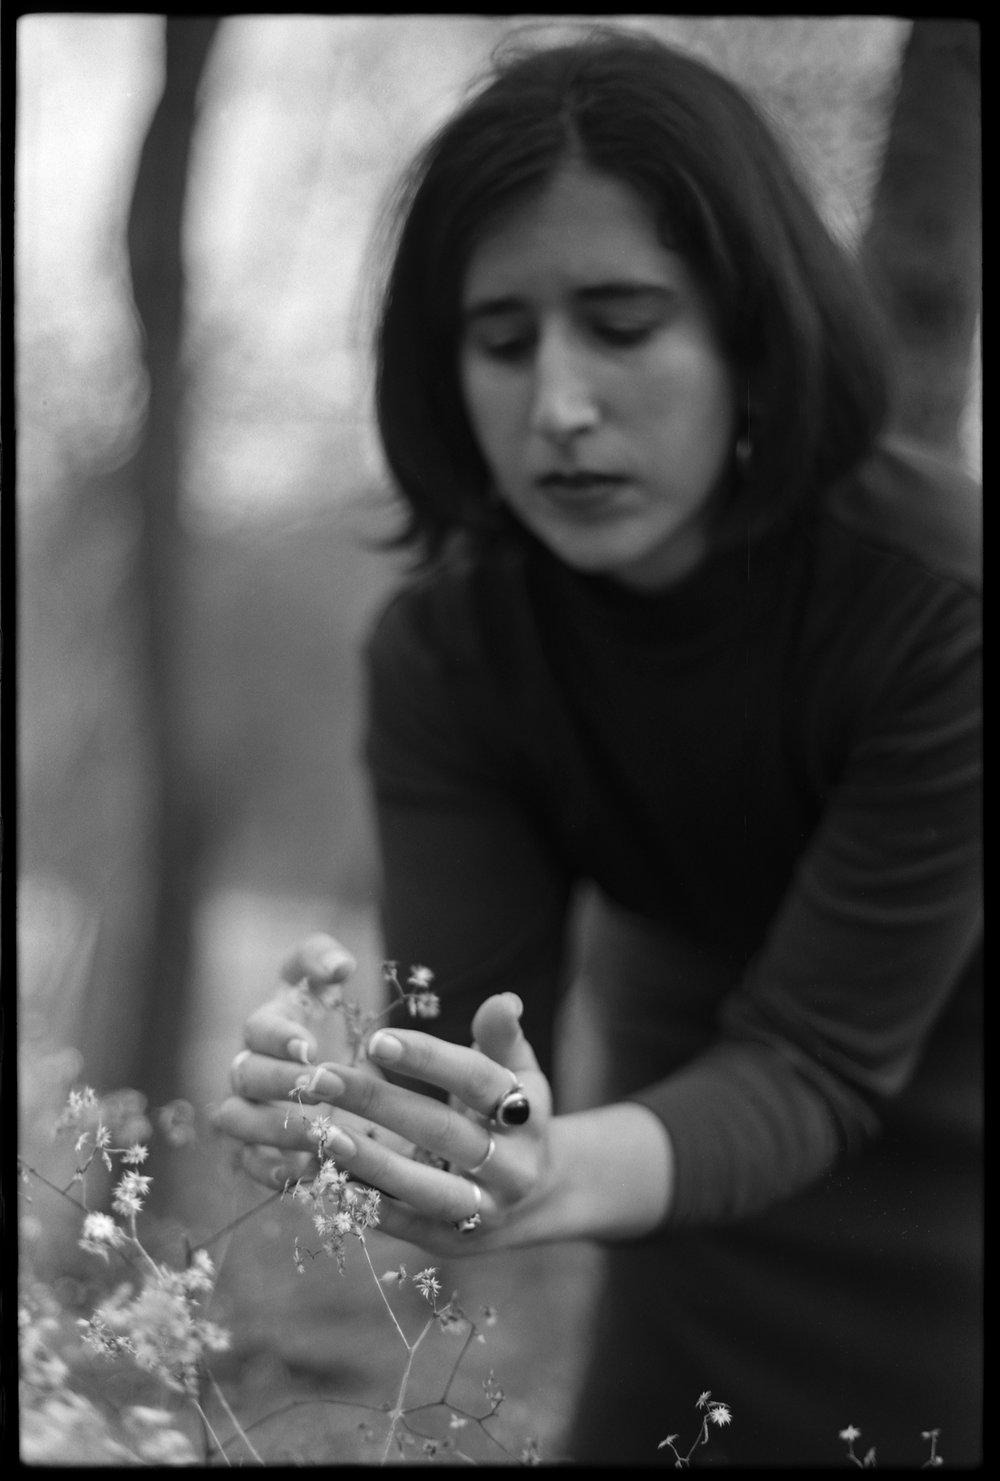 Experimental movement, music, and motion picture:  MUYASSAR KURDI